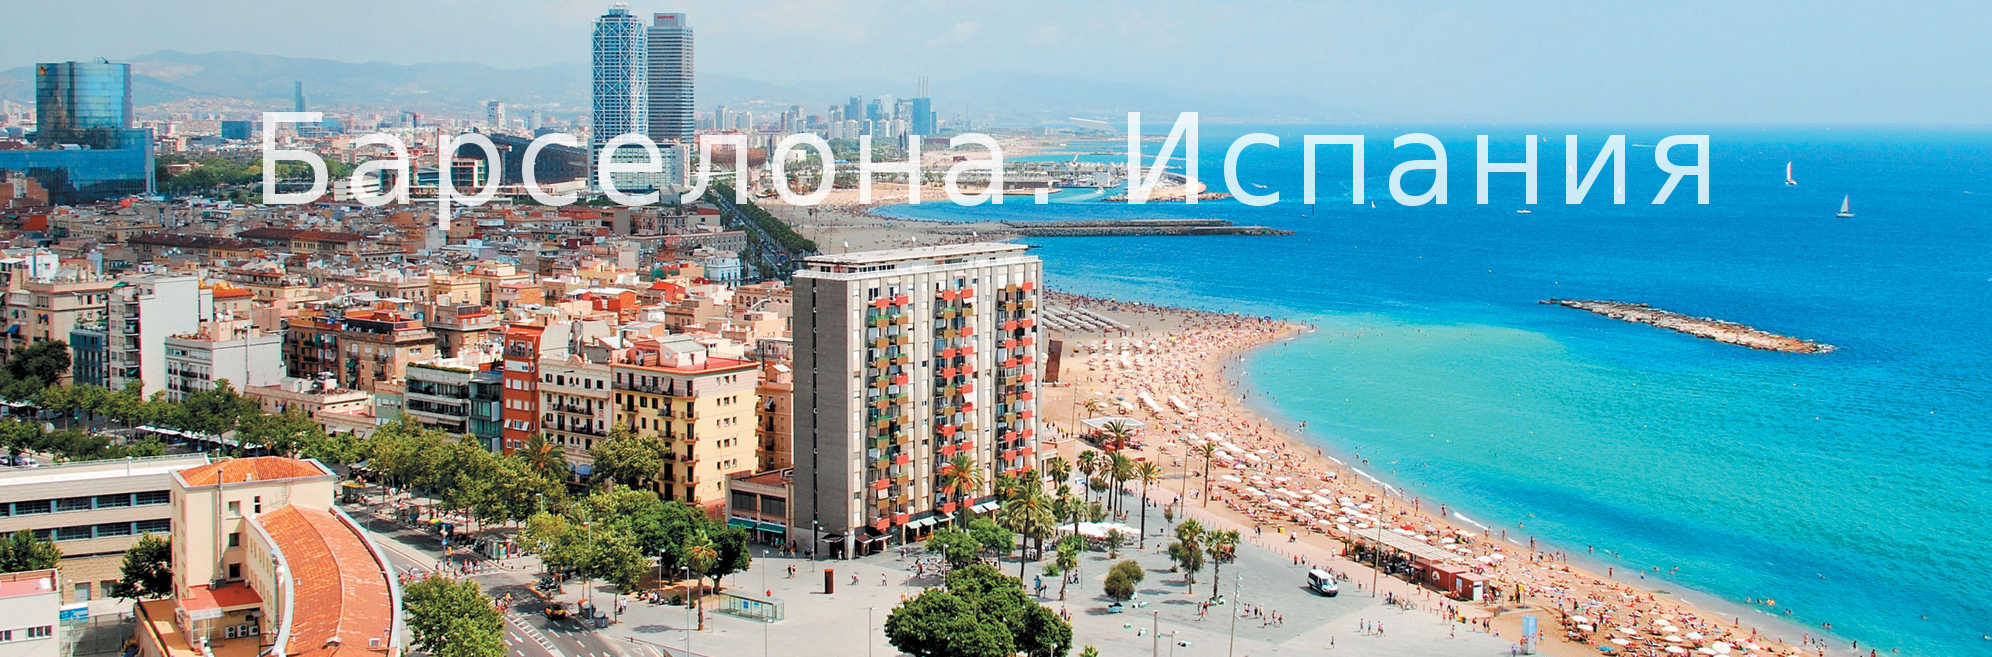 Барселона, Испания, море, бюджетные путешествия